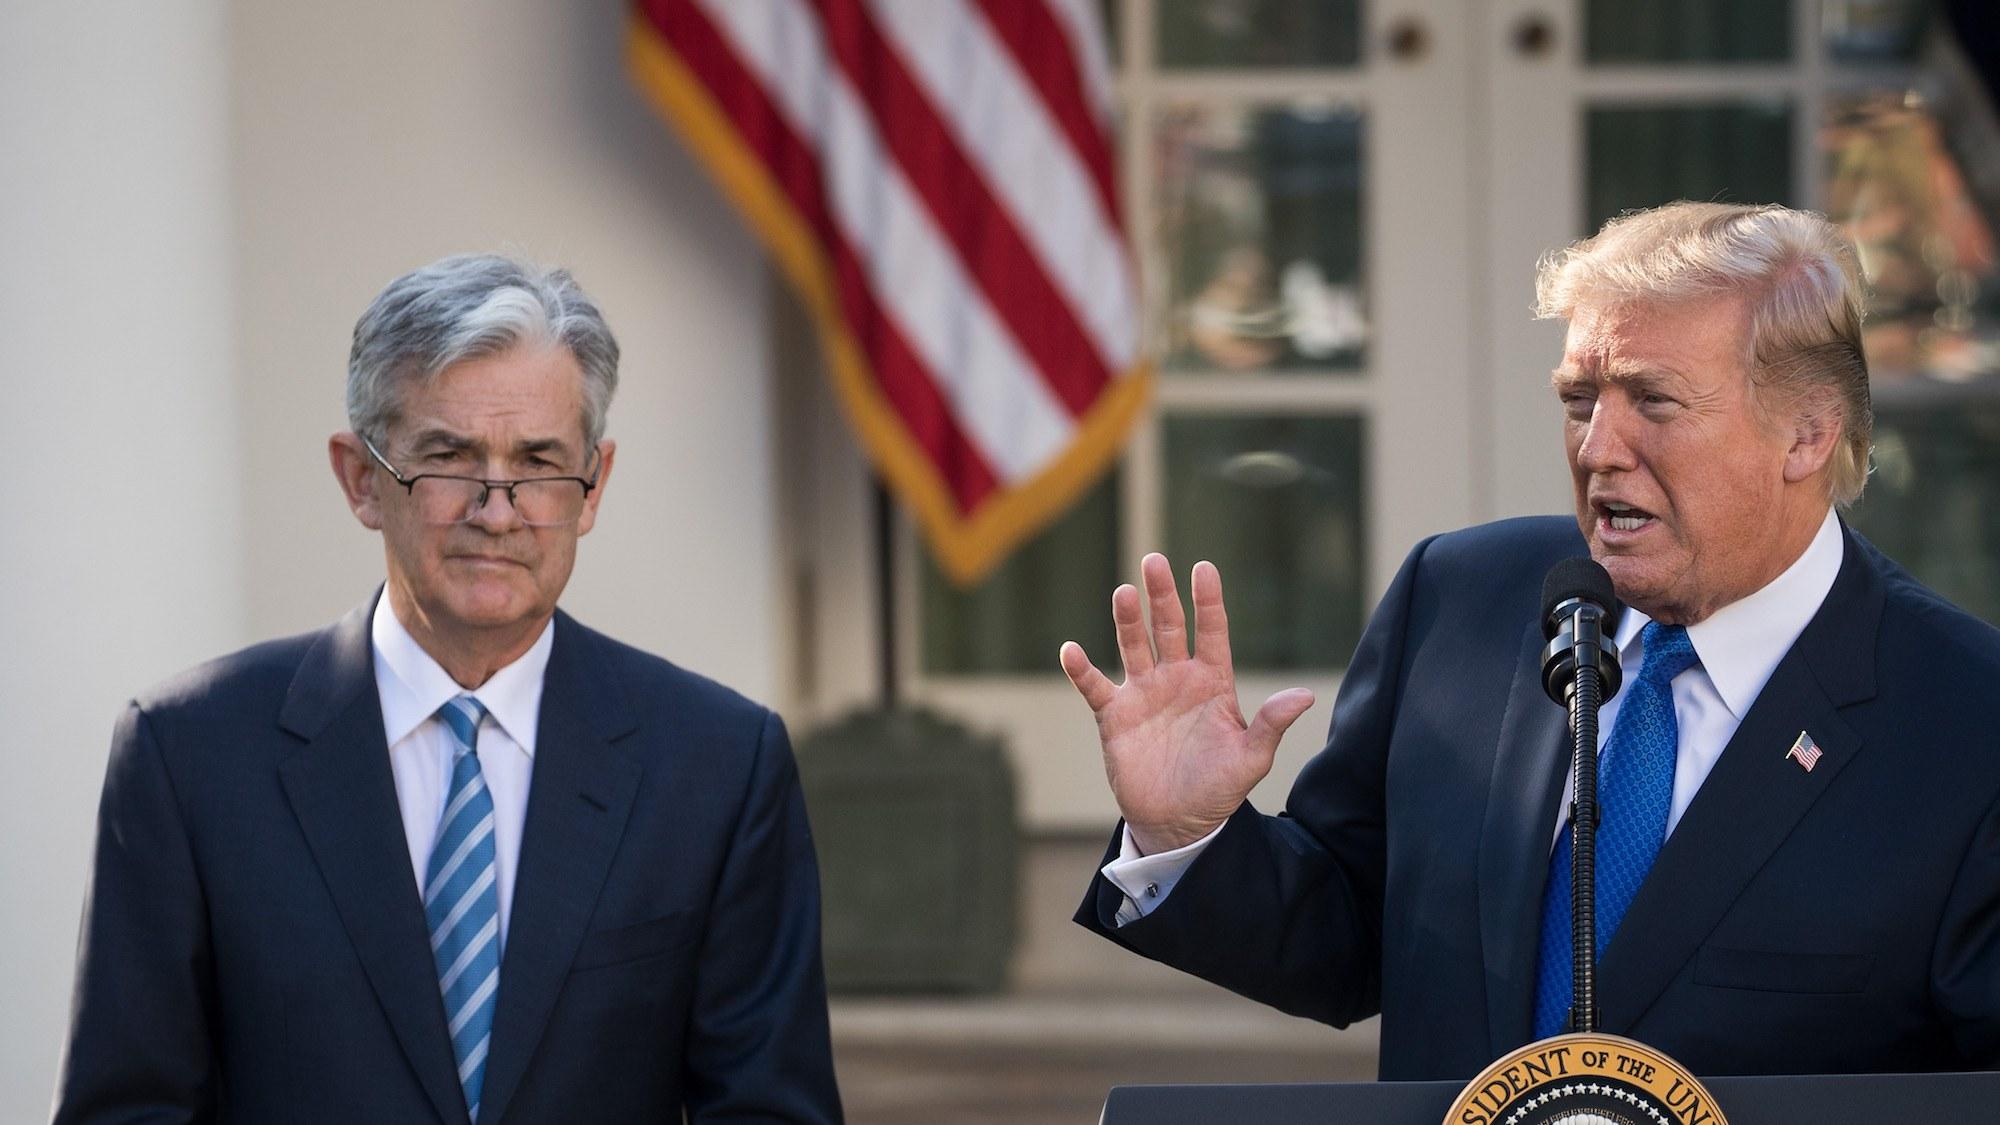 Trump Pressures Fed for More Rate Cuts as Mega-Banks Drain the Balance Sheet